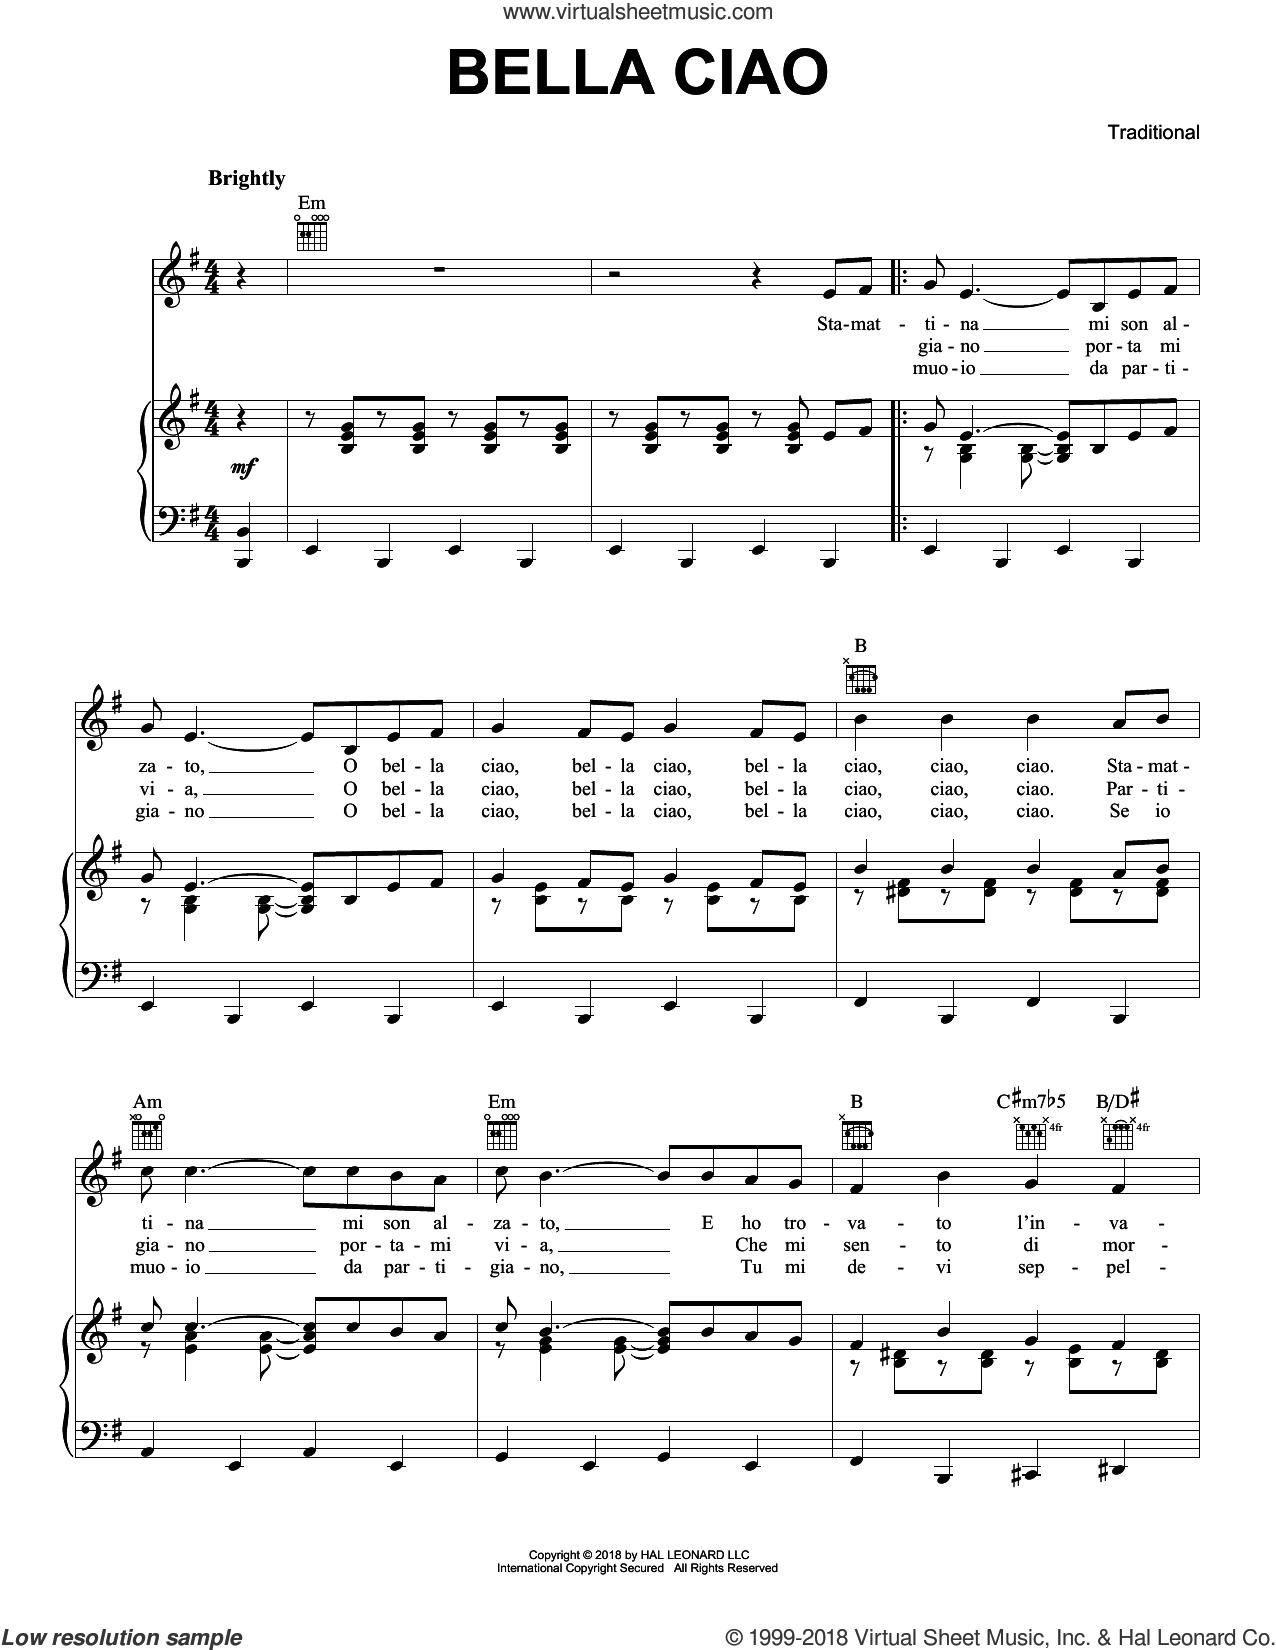 Bella Ciao sheet music for voice, piano or guitar, intermediate skill level